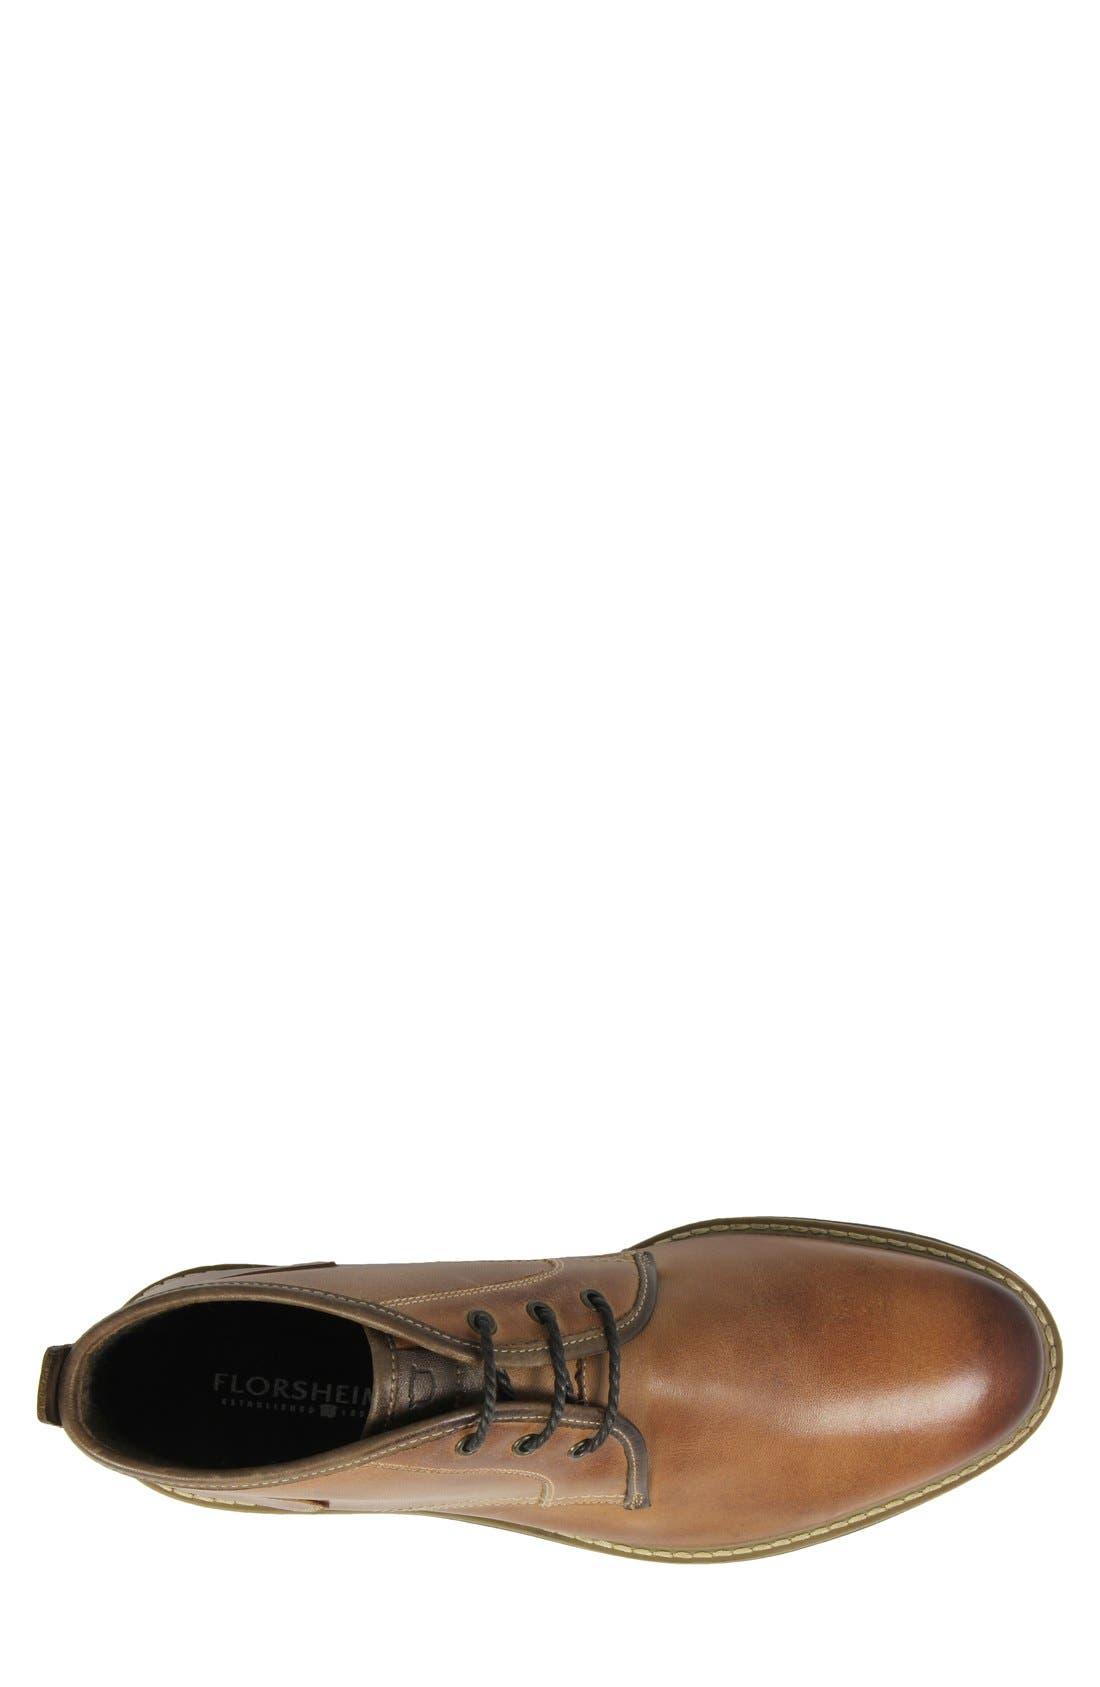 Alternate Image 3  - Florsheim 'Casey' Chukka Boot (Men)